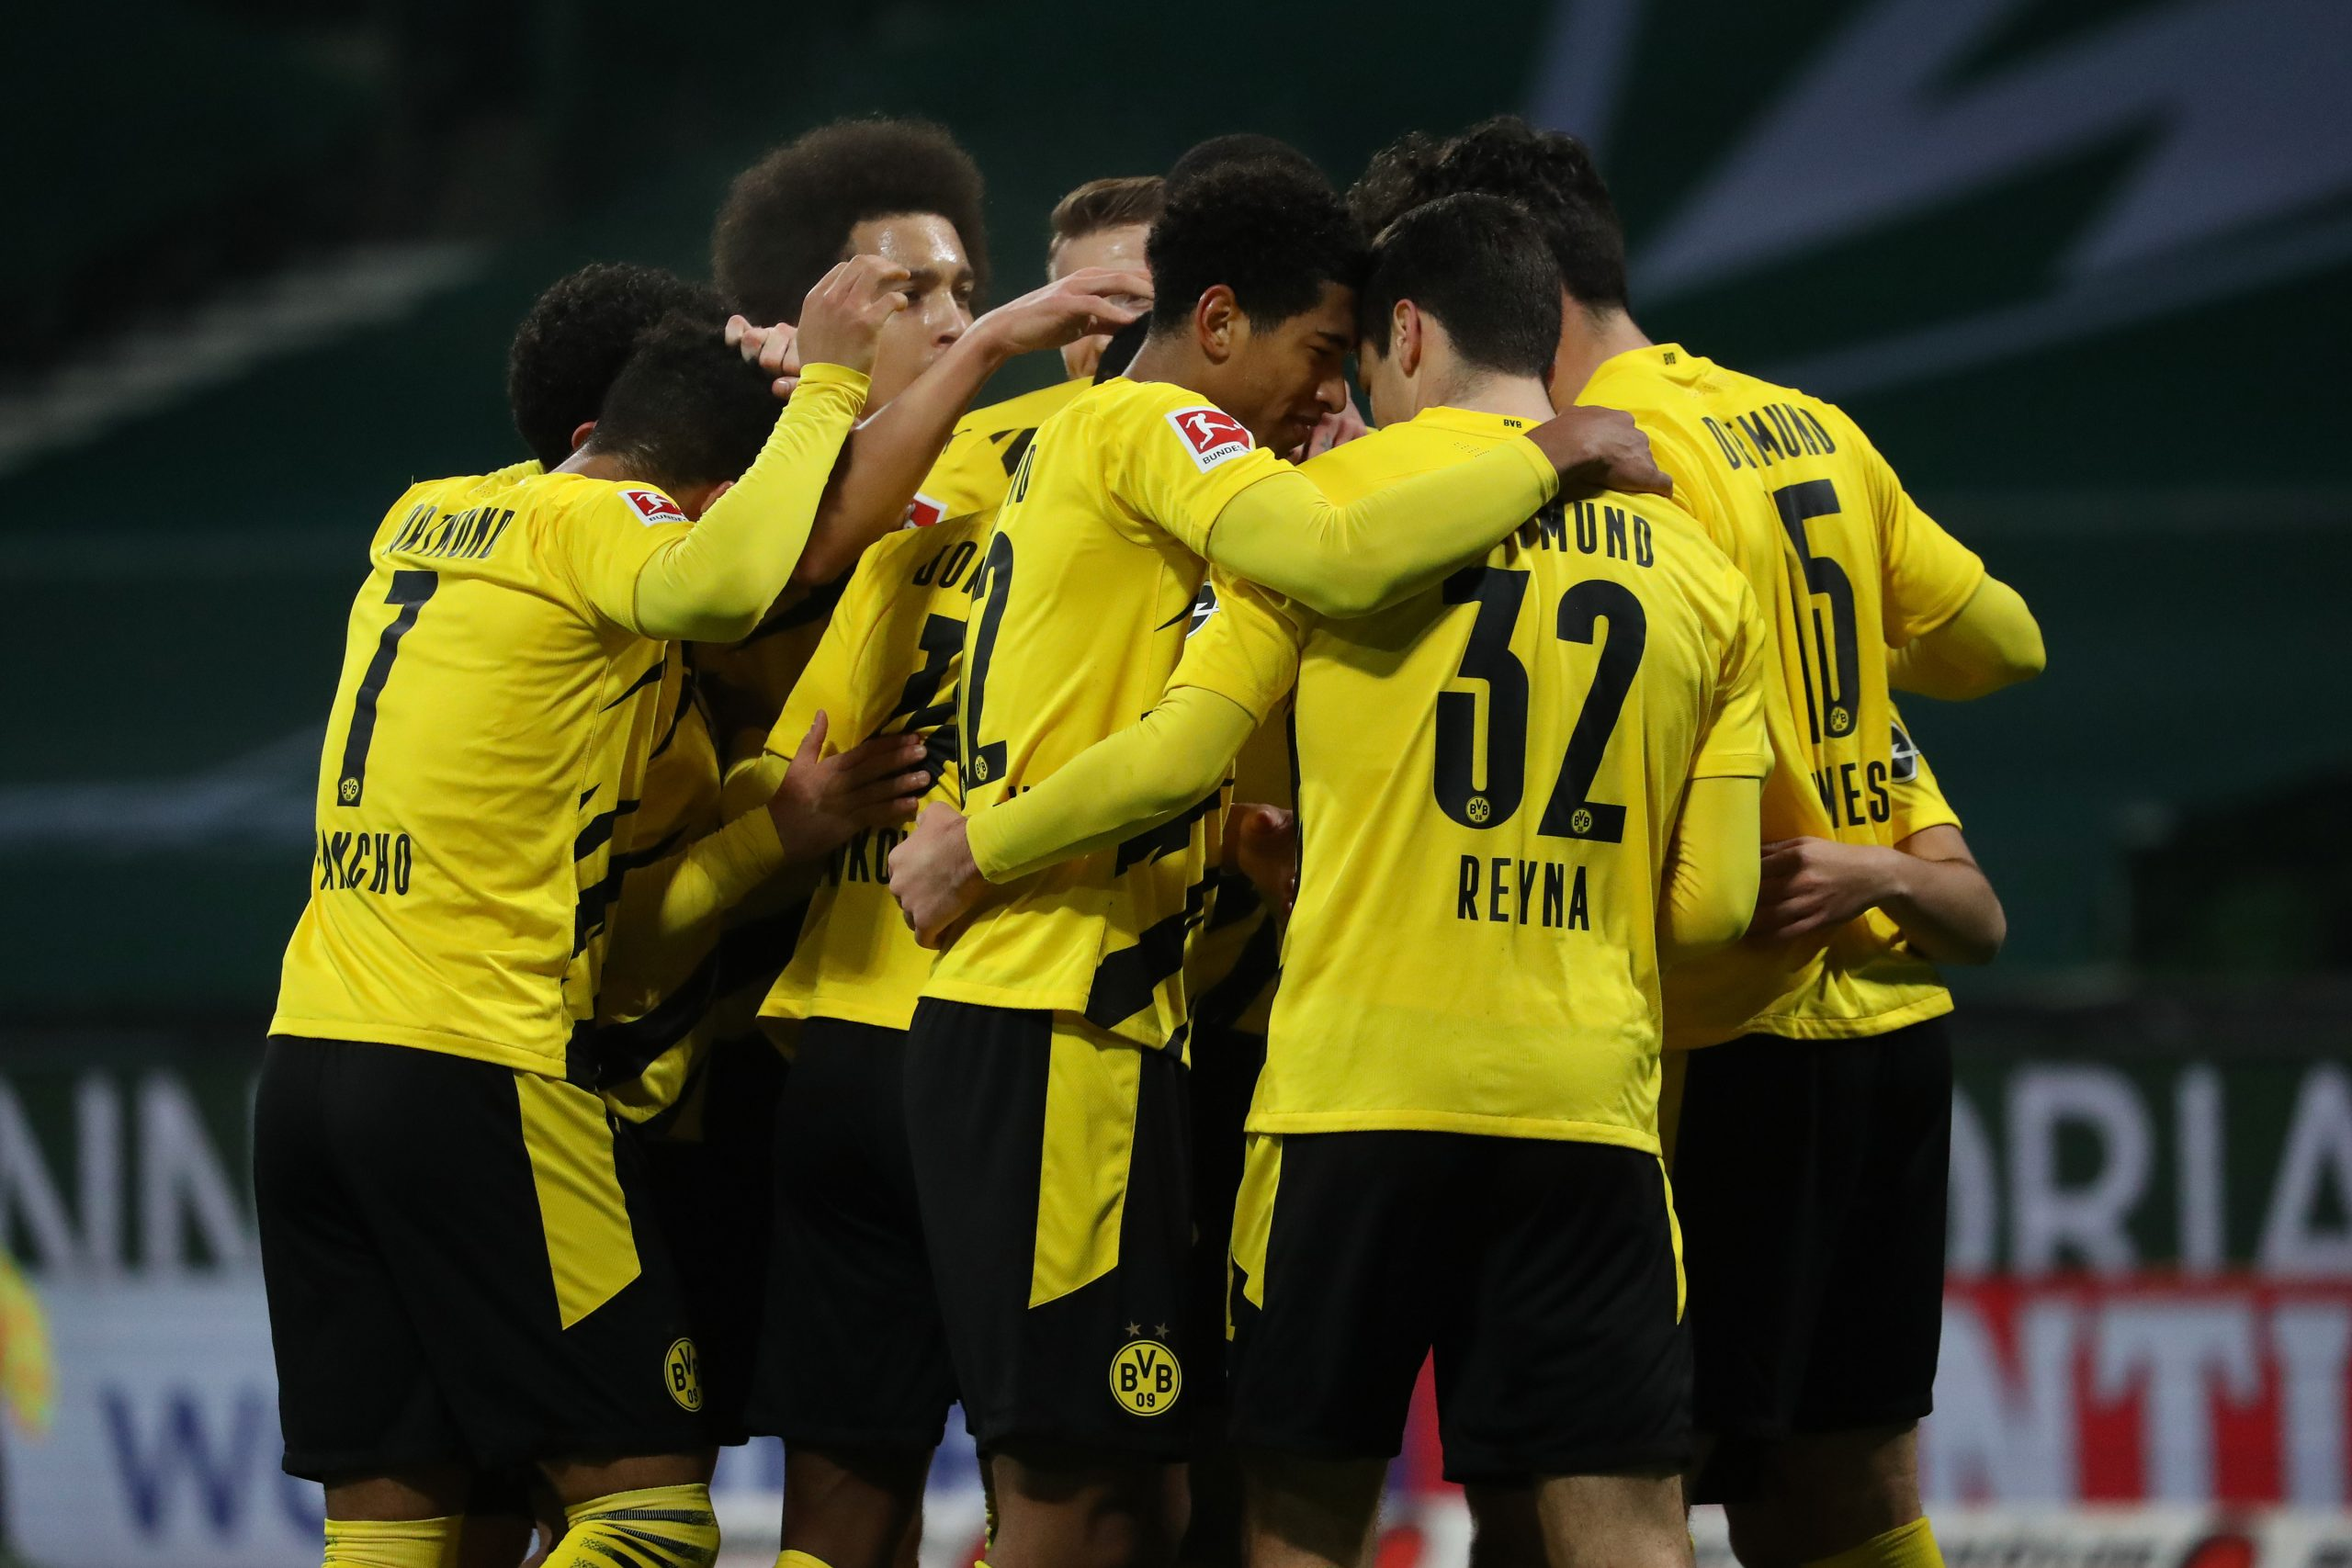 Werder Bremen vs Borussia Dortmund - A Terzic win